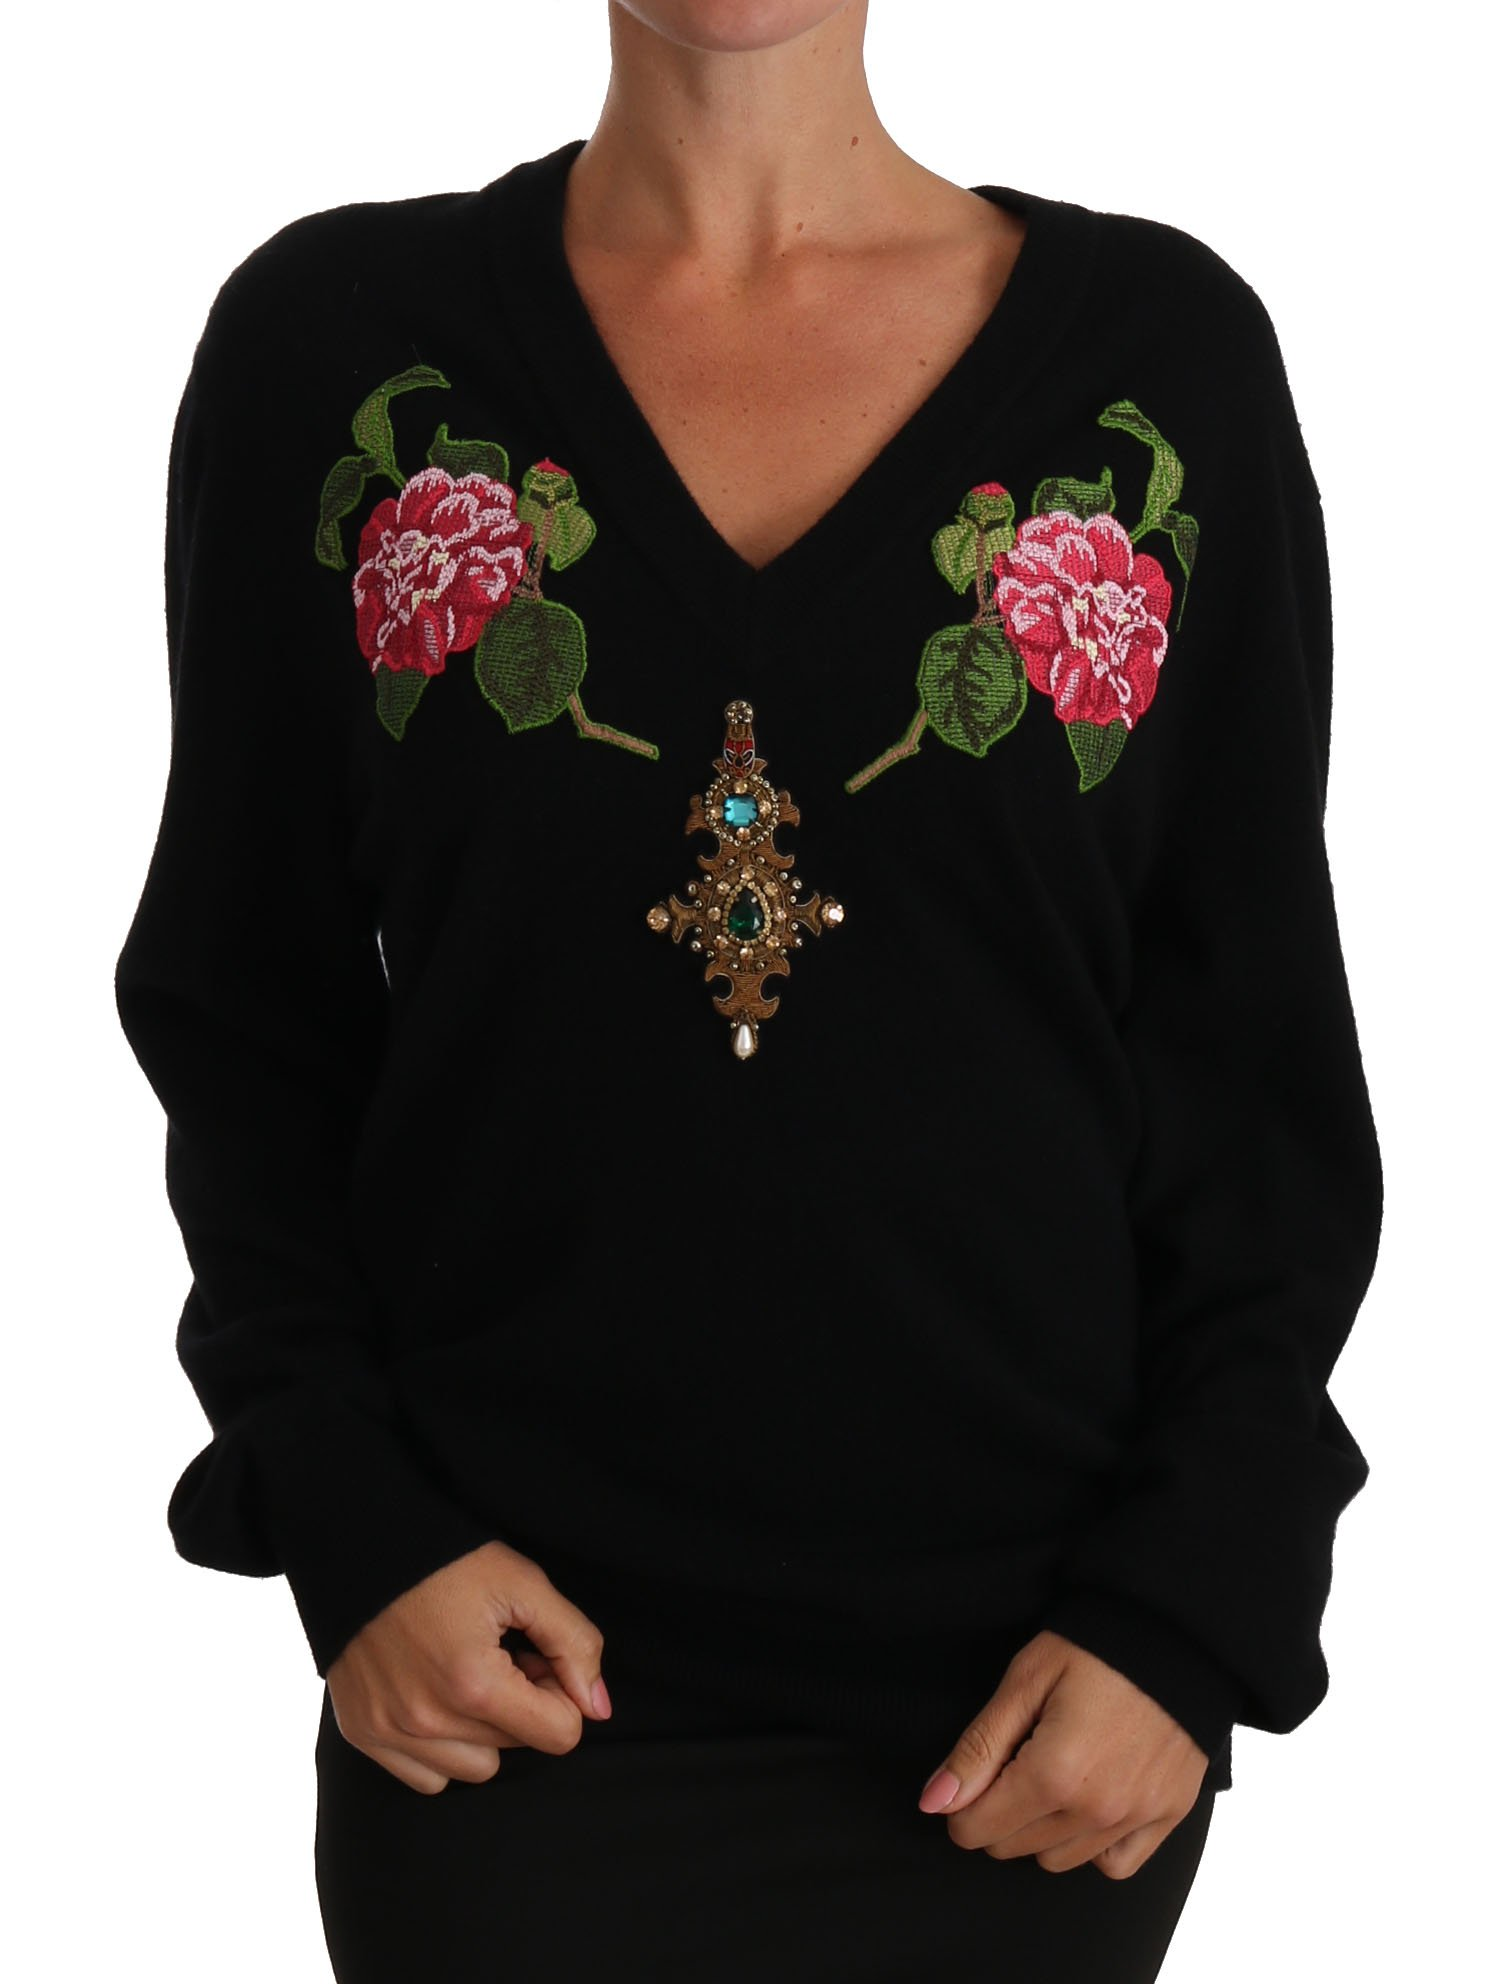 Dolce & Gabbana Women's Rose Floral Crystal Cashmere Sweater Black TSH2768 - IT40|S